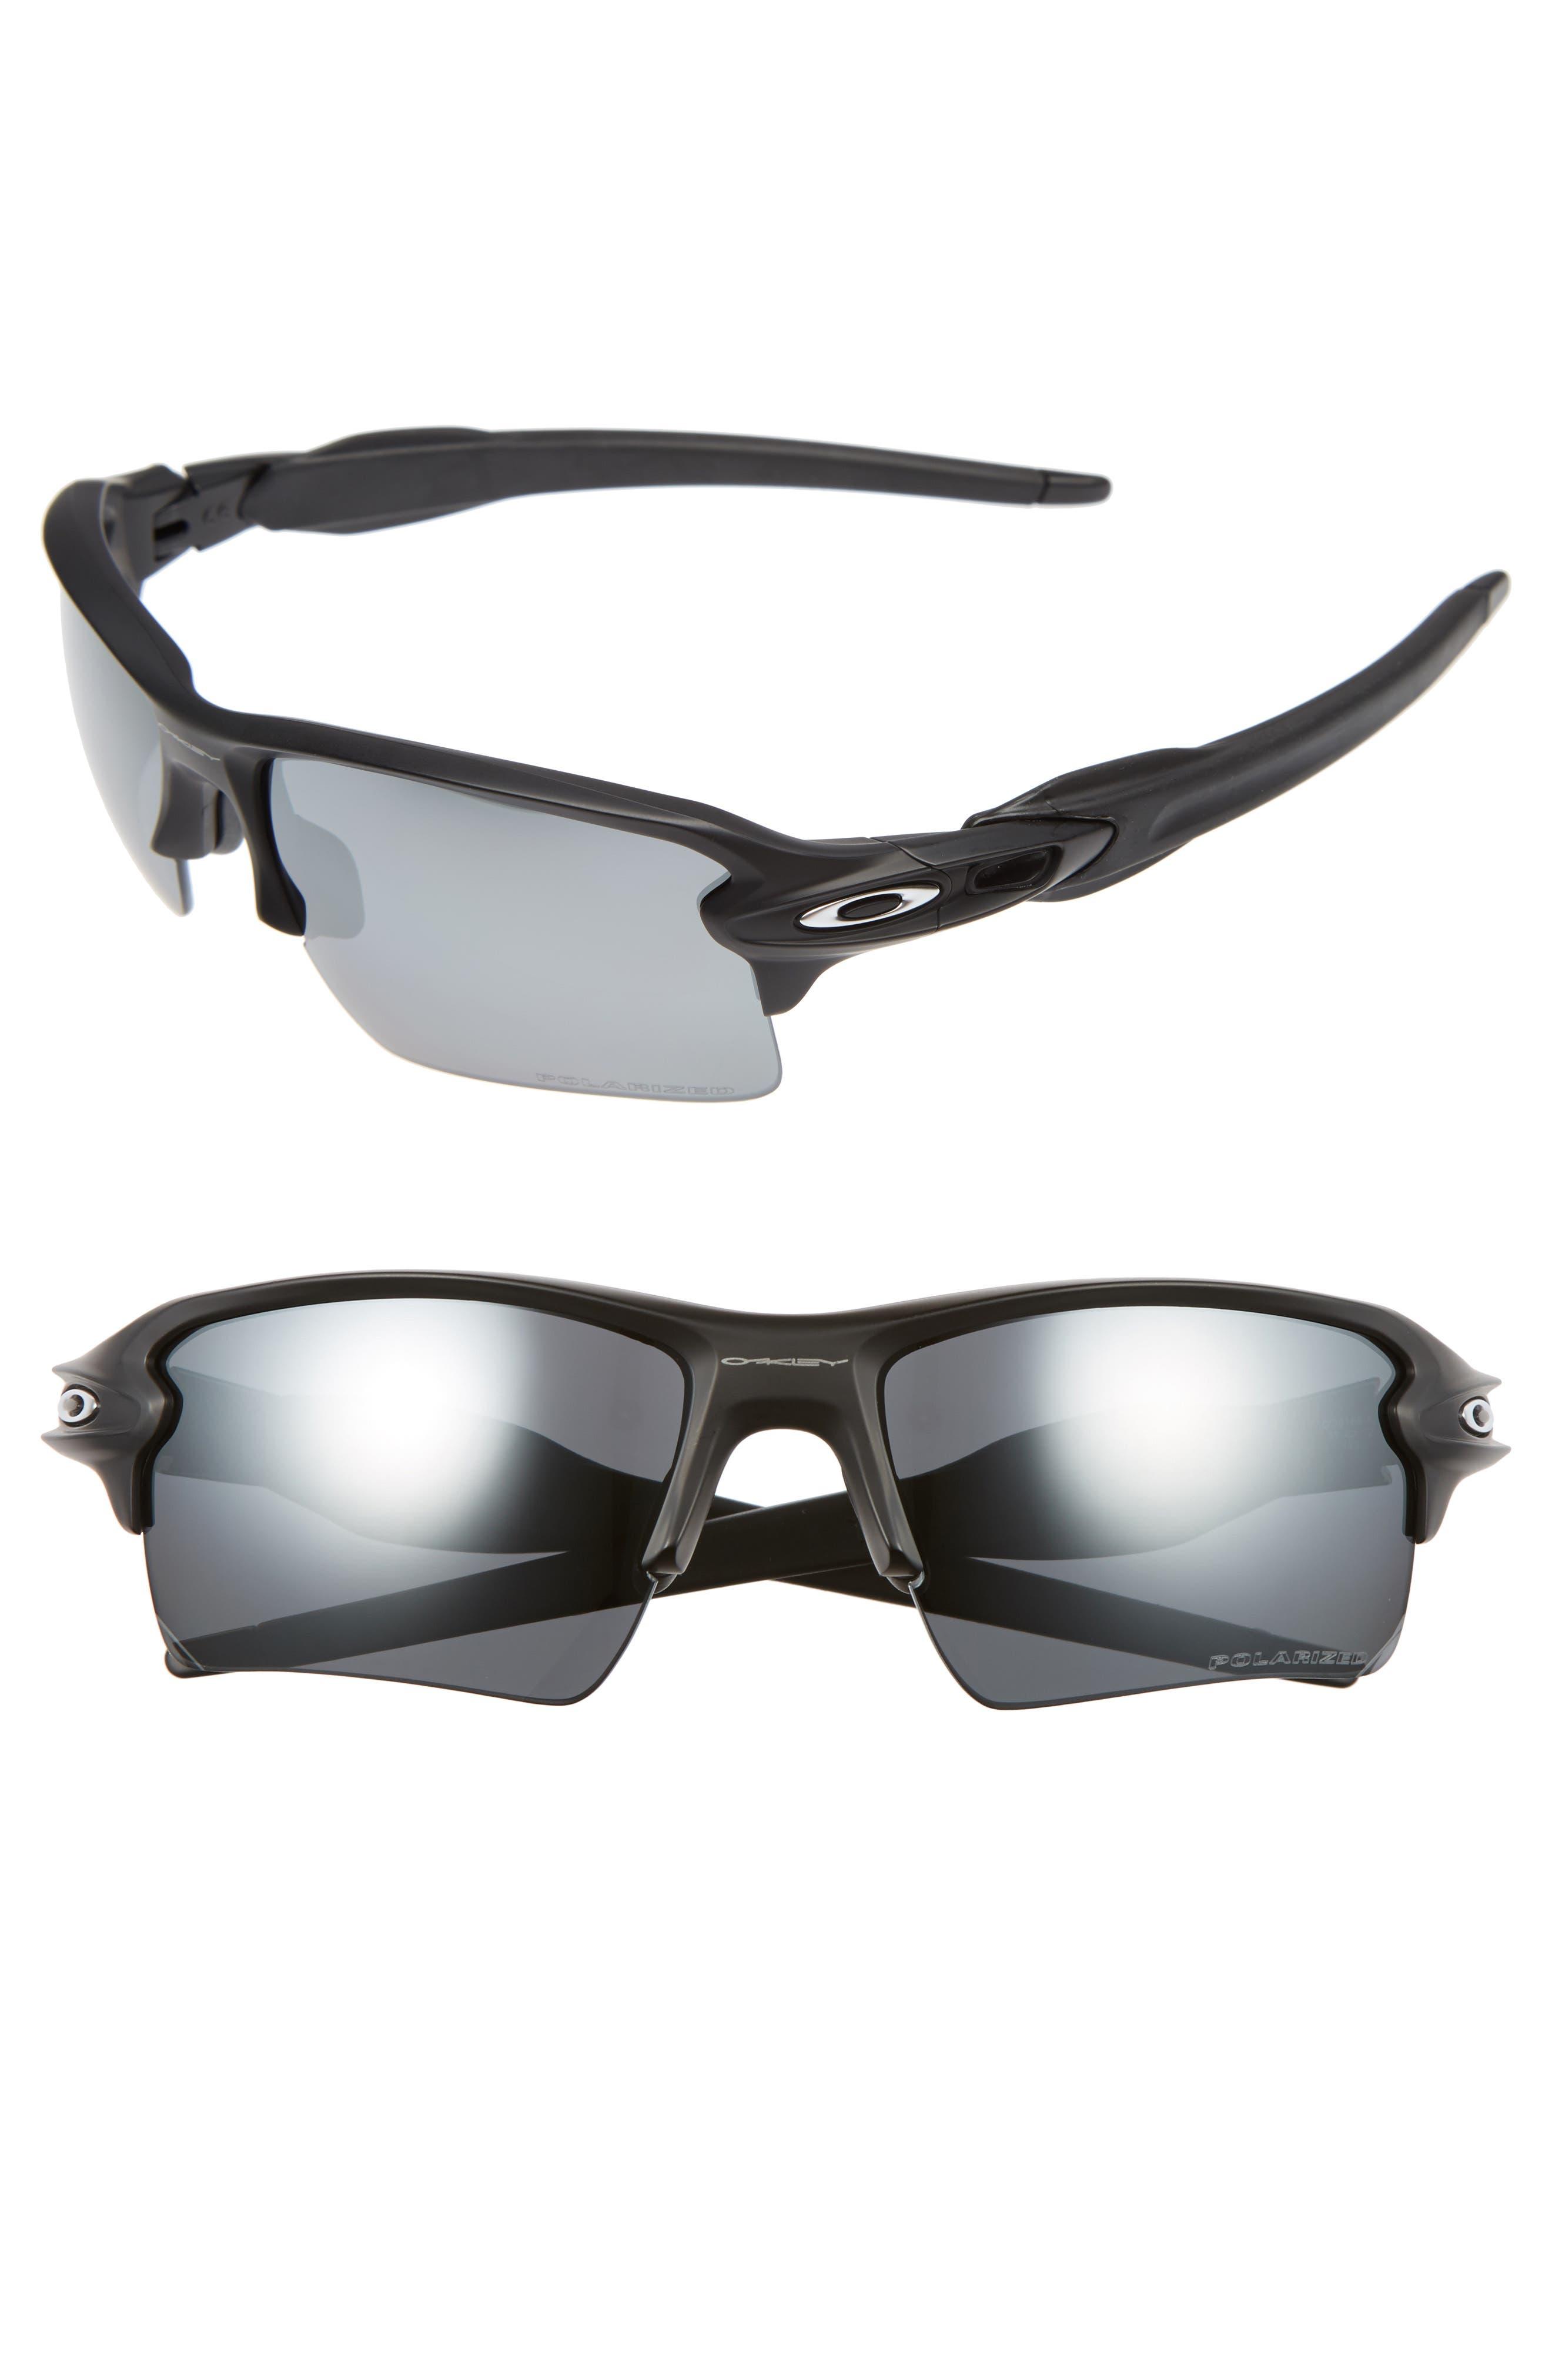 Flak 2.0 XL 59mm Polarized Sunglasses,                             Alternate thumbnail 2, color,                             001